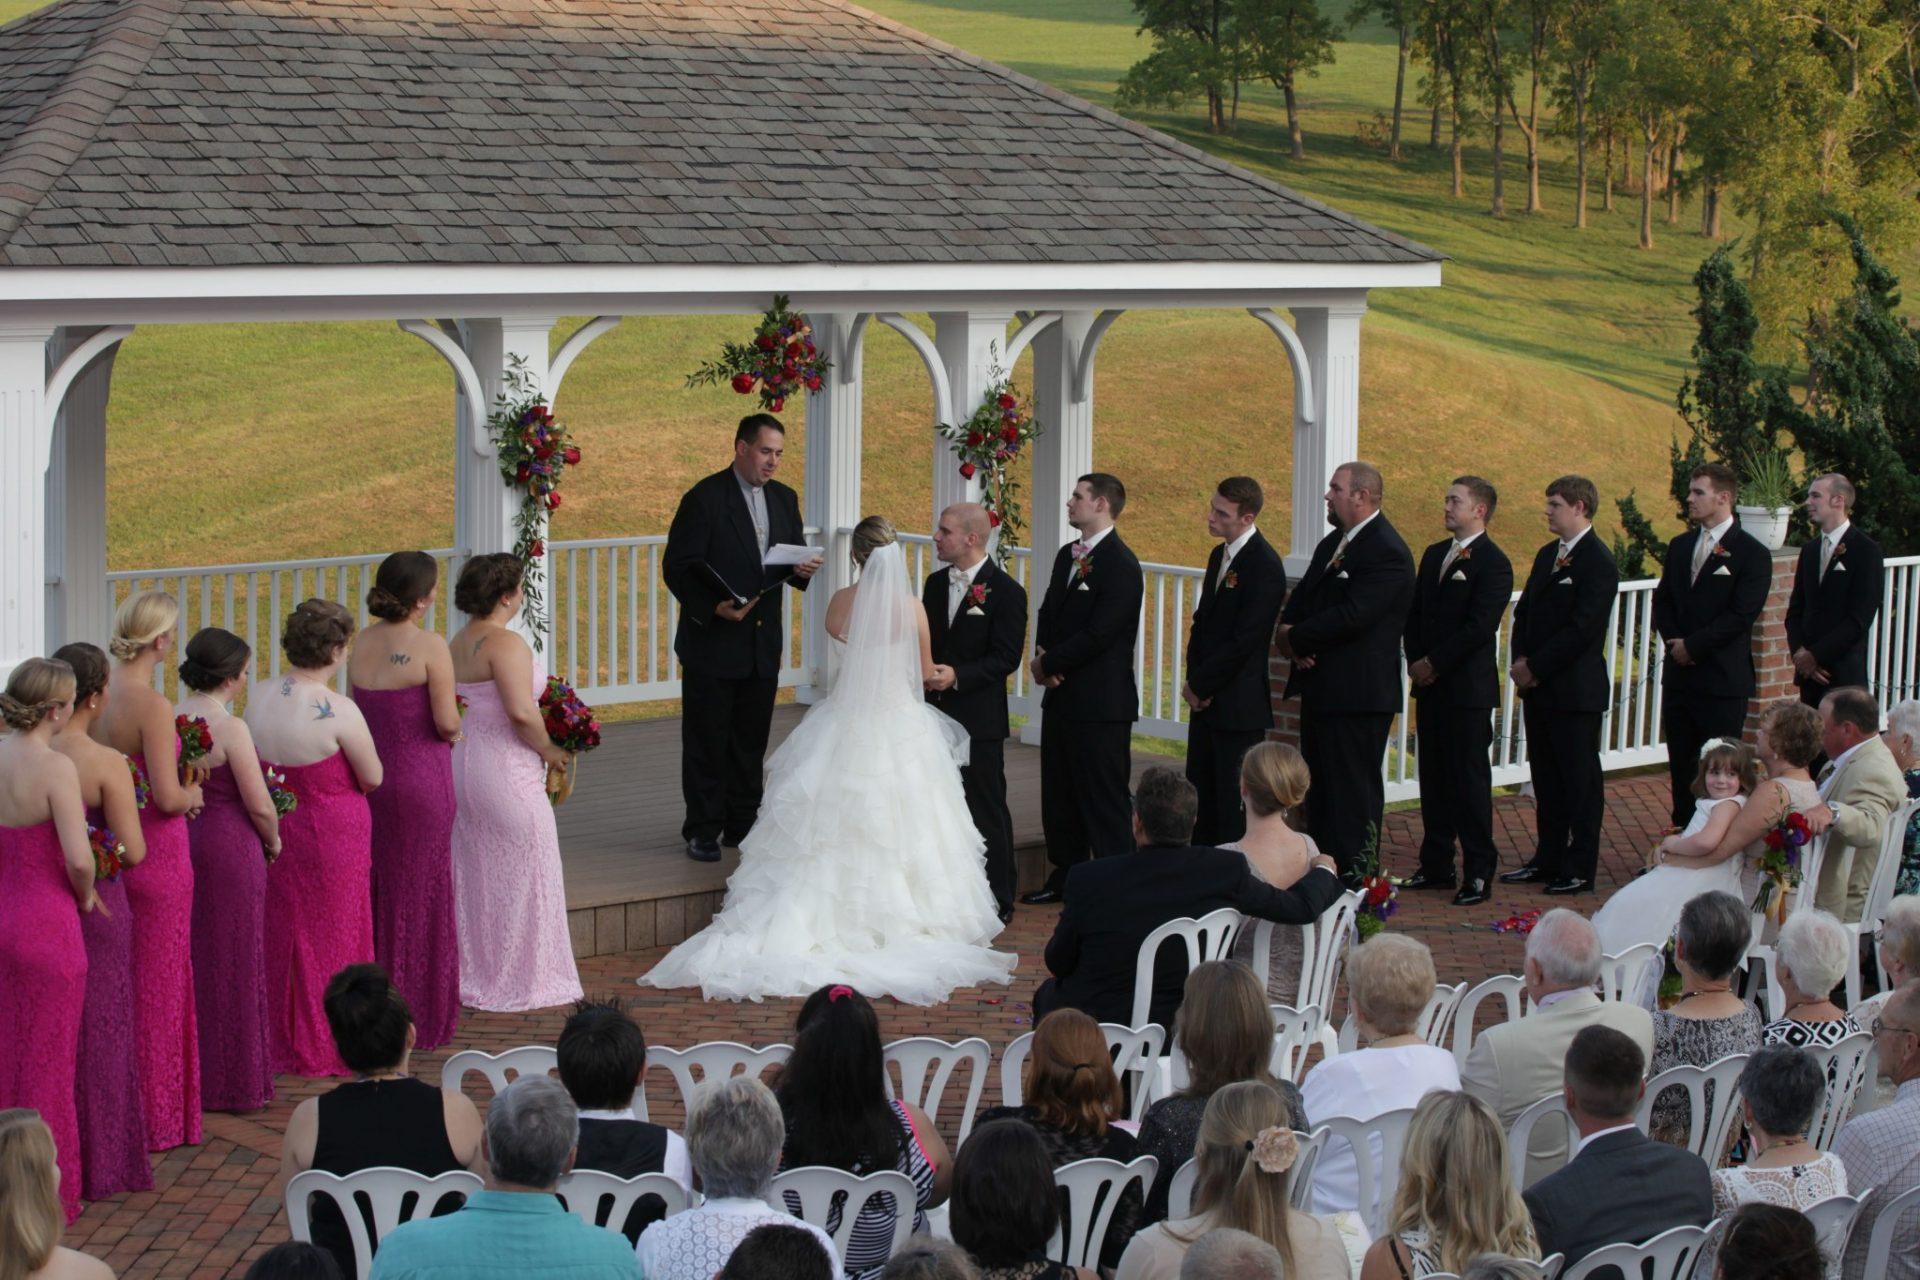 Matt & Olivia's Summer Wedding in Maryland with Fireworks • Morningside Inn